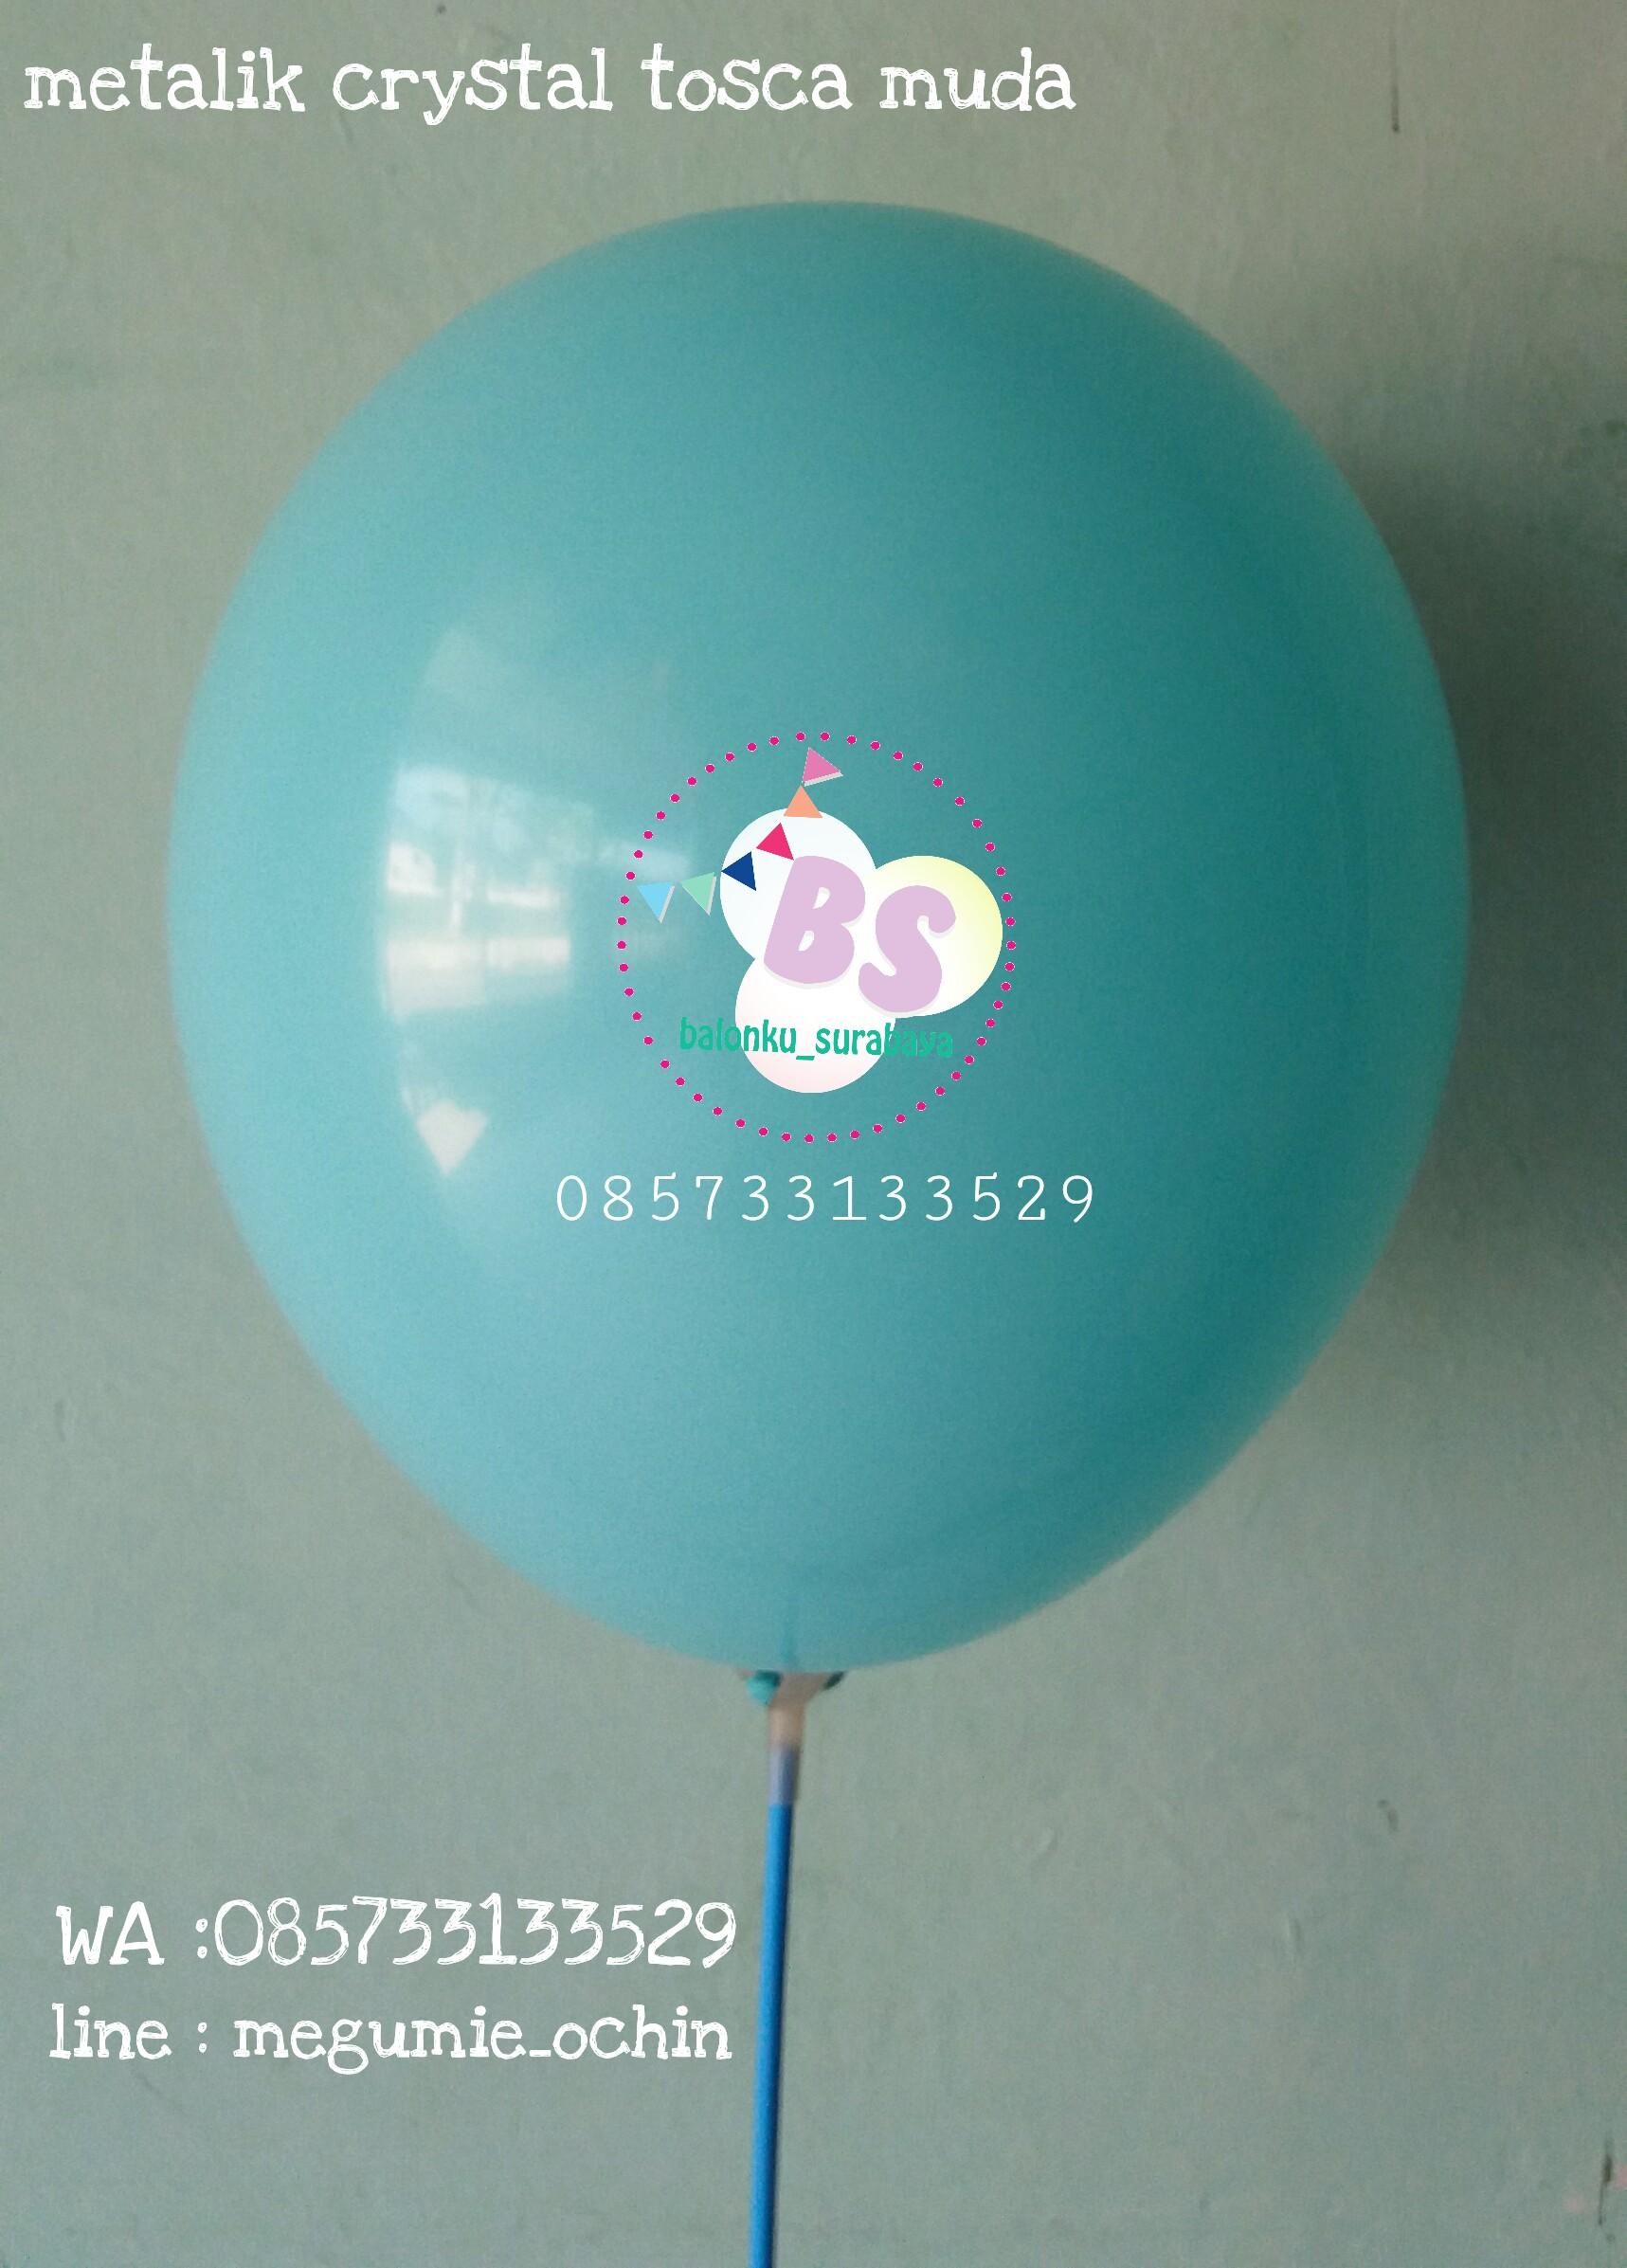 balon tosca, balon doff, balon latex doff, balon ulang tahun, balon dekorasi, balon foil, balon metalik, balon twist, balon latex, balon huruf, balon angka, supplier balon, dekorasi balon, sablon balon, confetti, bendera ulang tahun, balon LED, lampion terbang